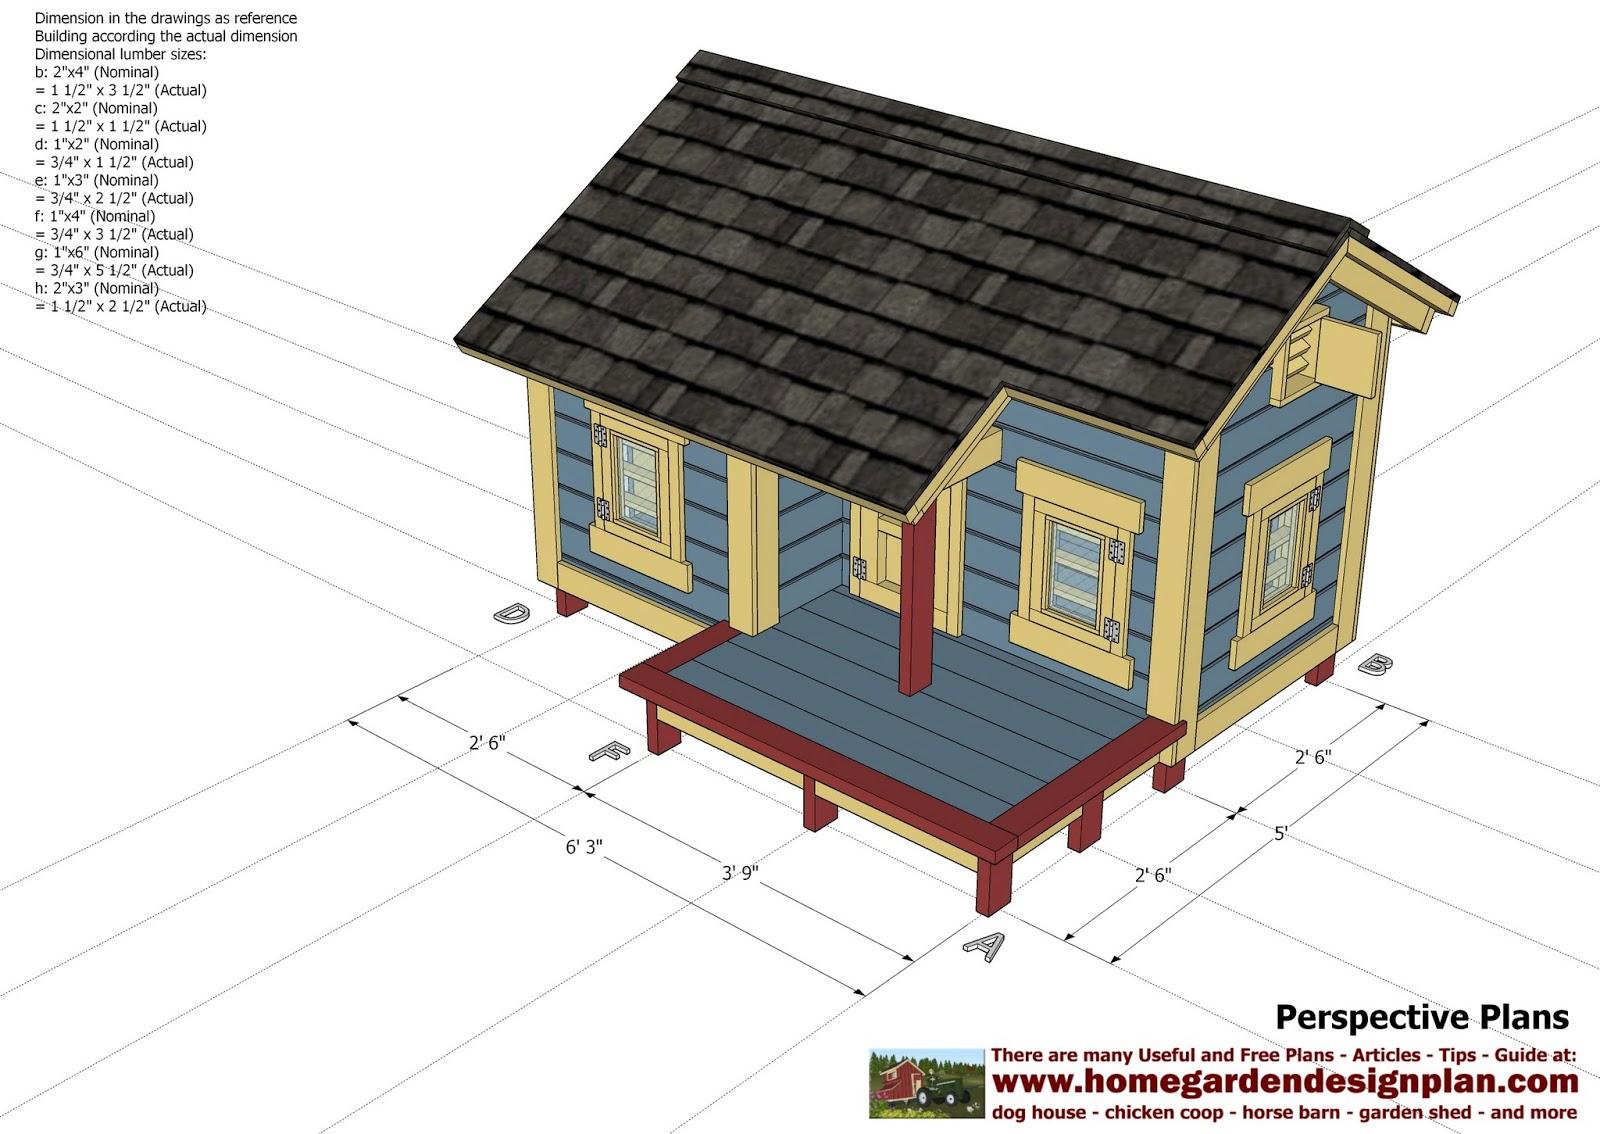 Home garden plans dh303 dog house plans dog house for Dog kennel building plans